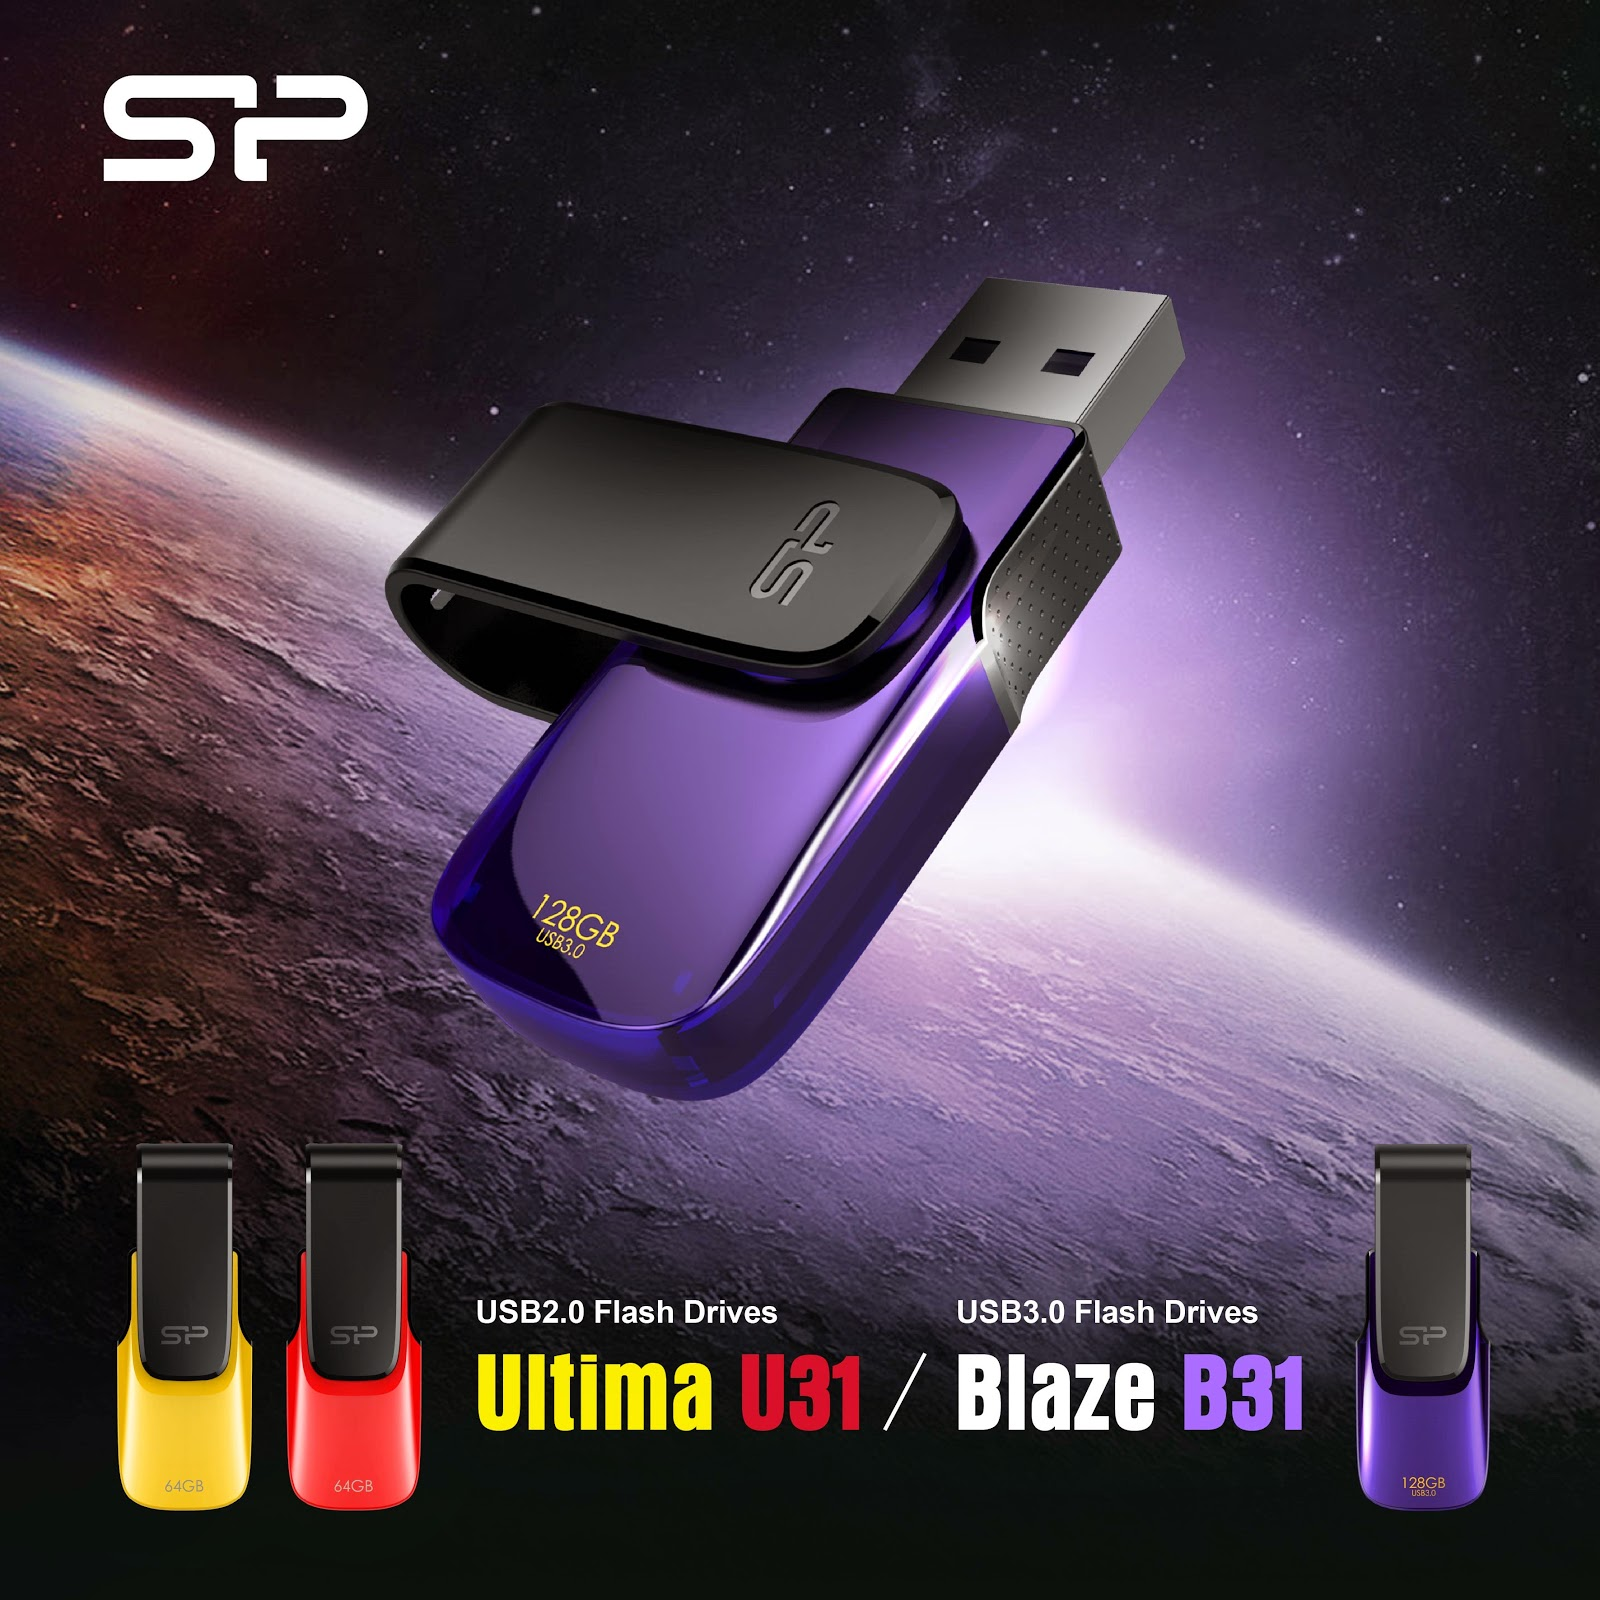 SP Ultima U31 and Blaze B31 Swivel USB flash drives